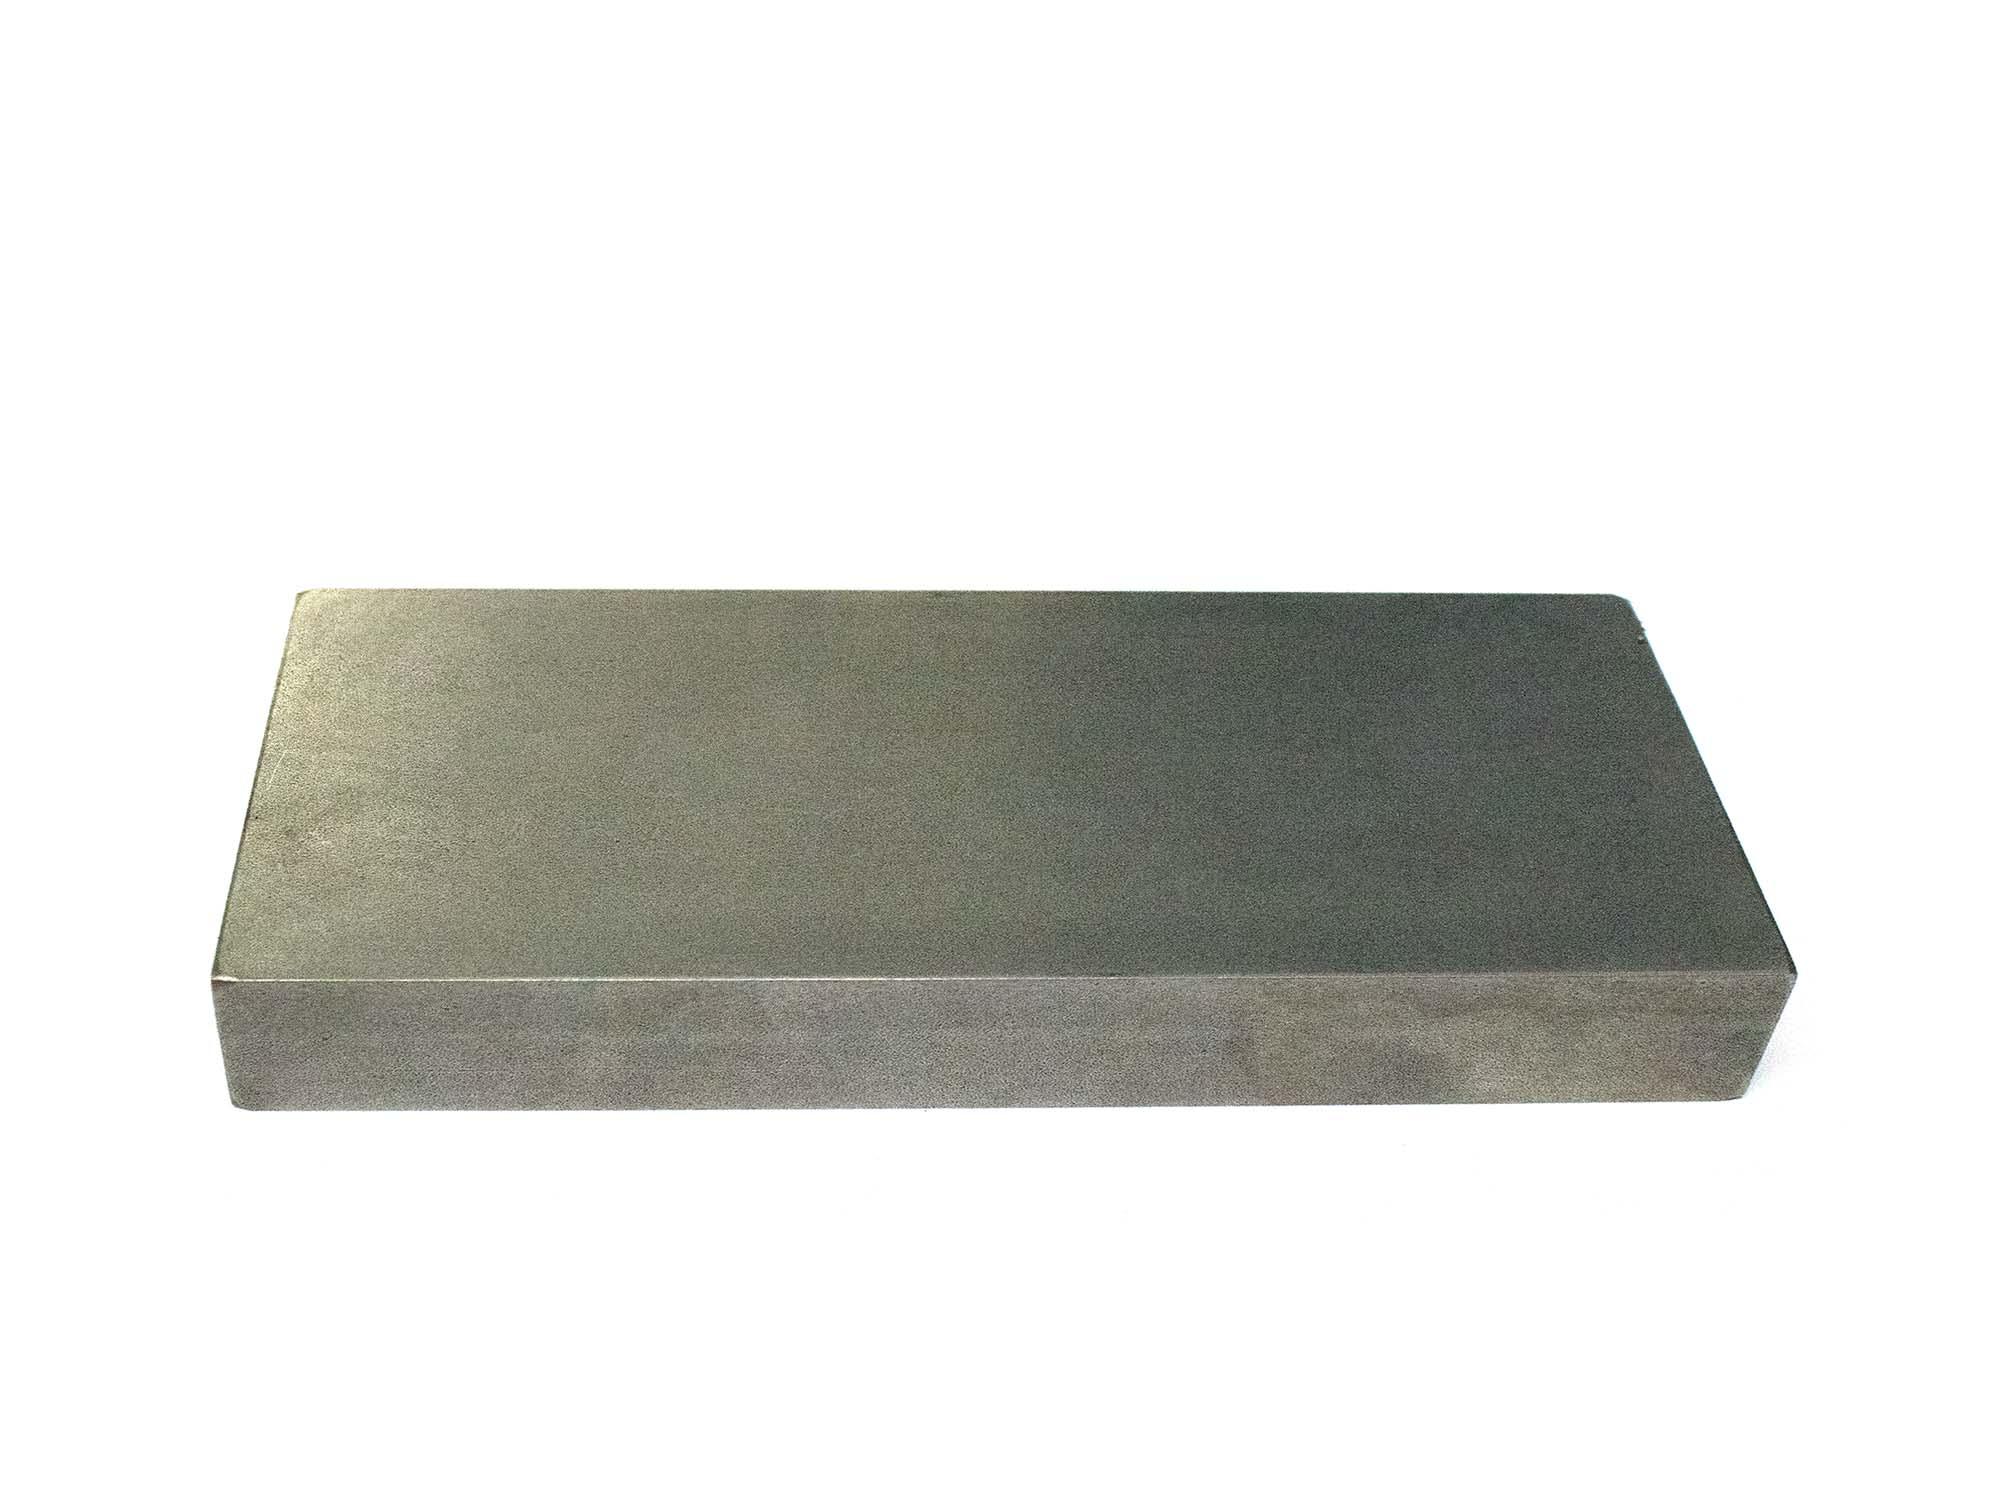 Stalen blok 200 x 80 x 30mm